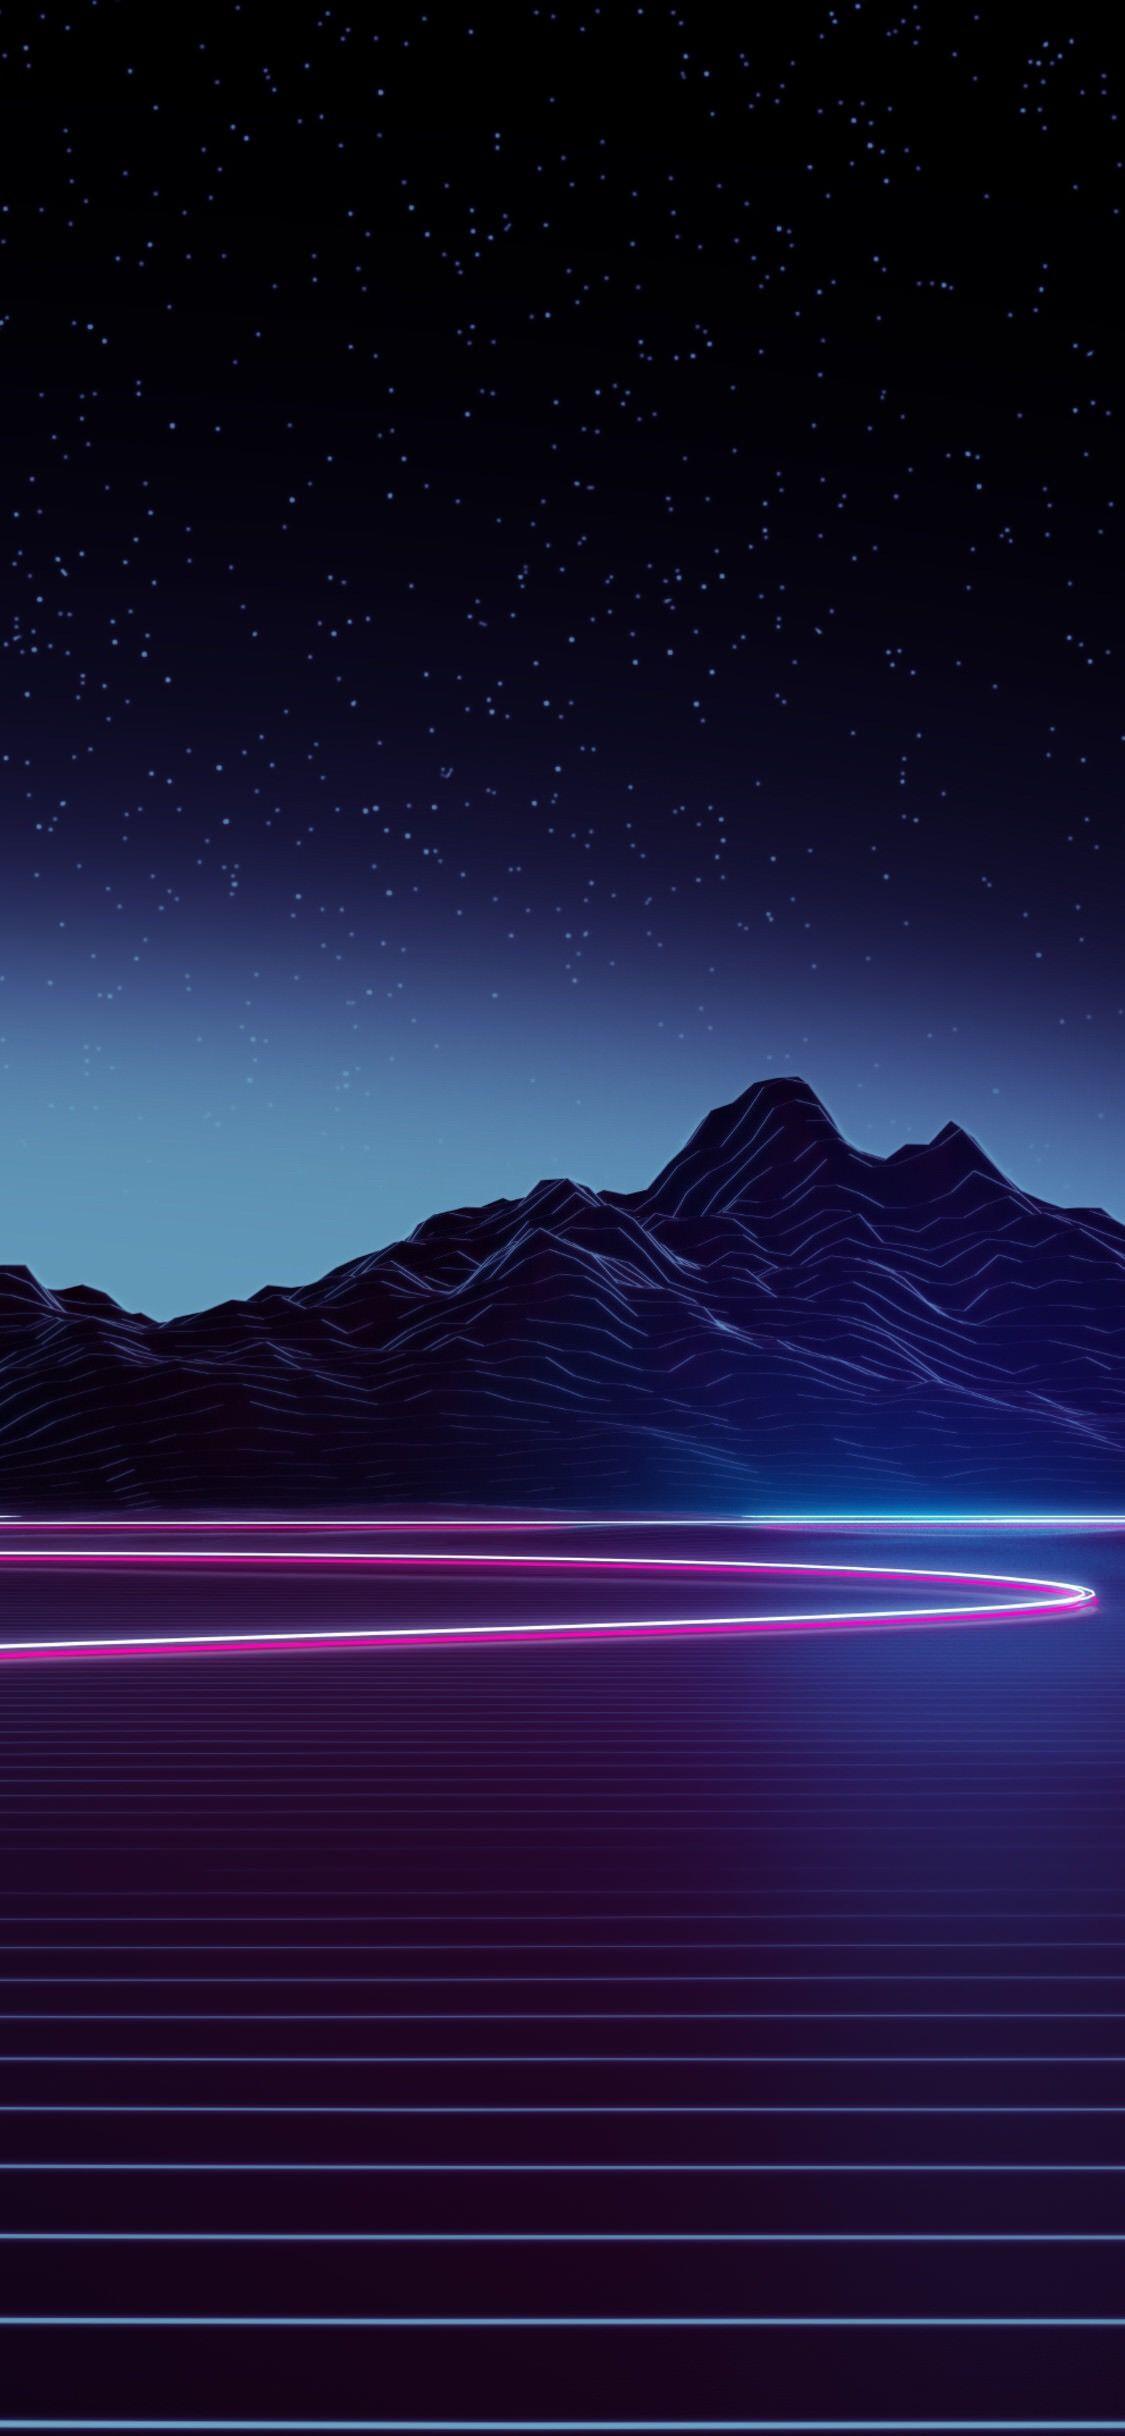 Pin by Erik Ybarra on Wallpapers | Wallpaper iphone neon ...